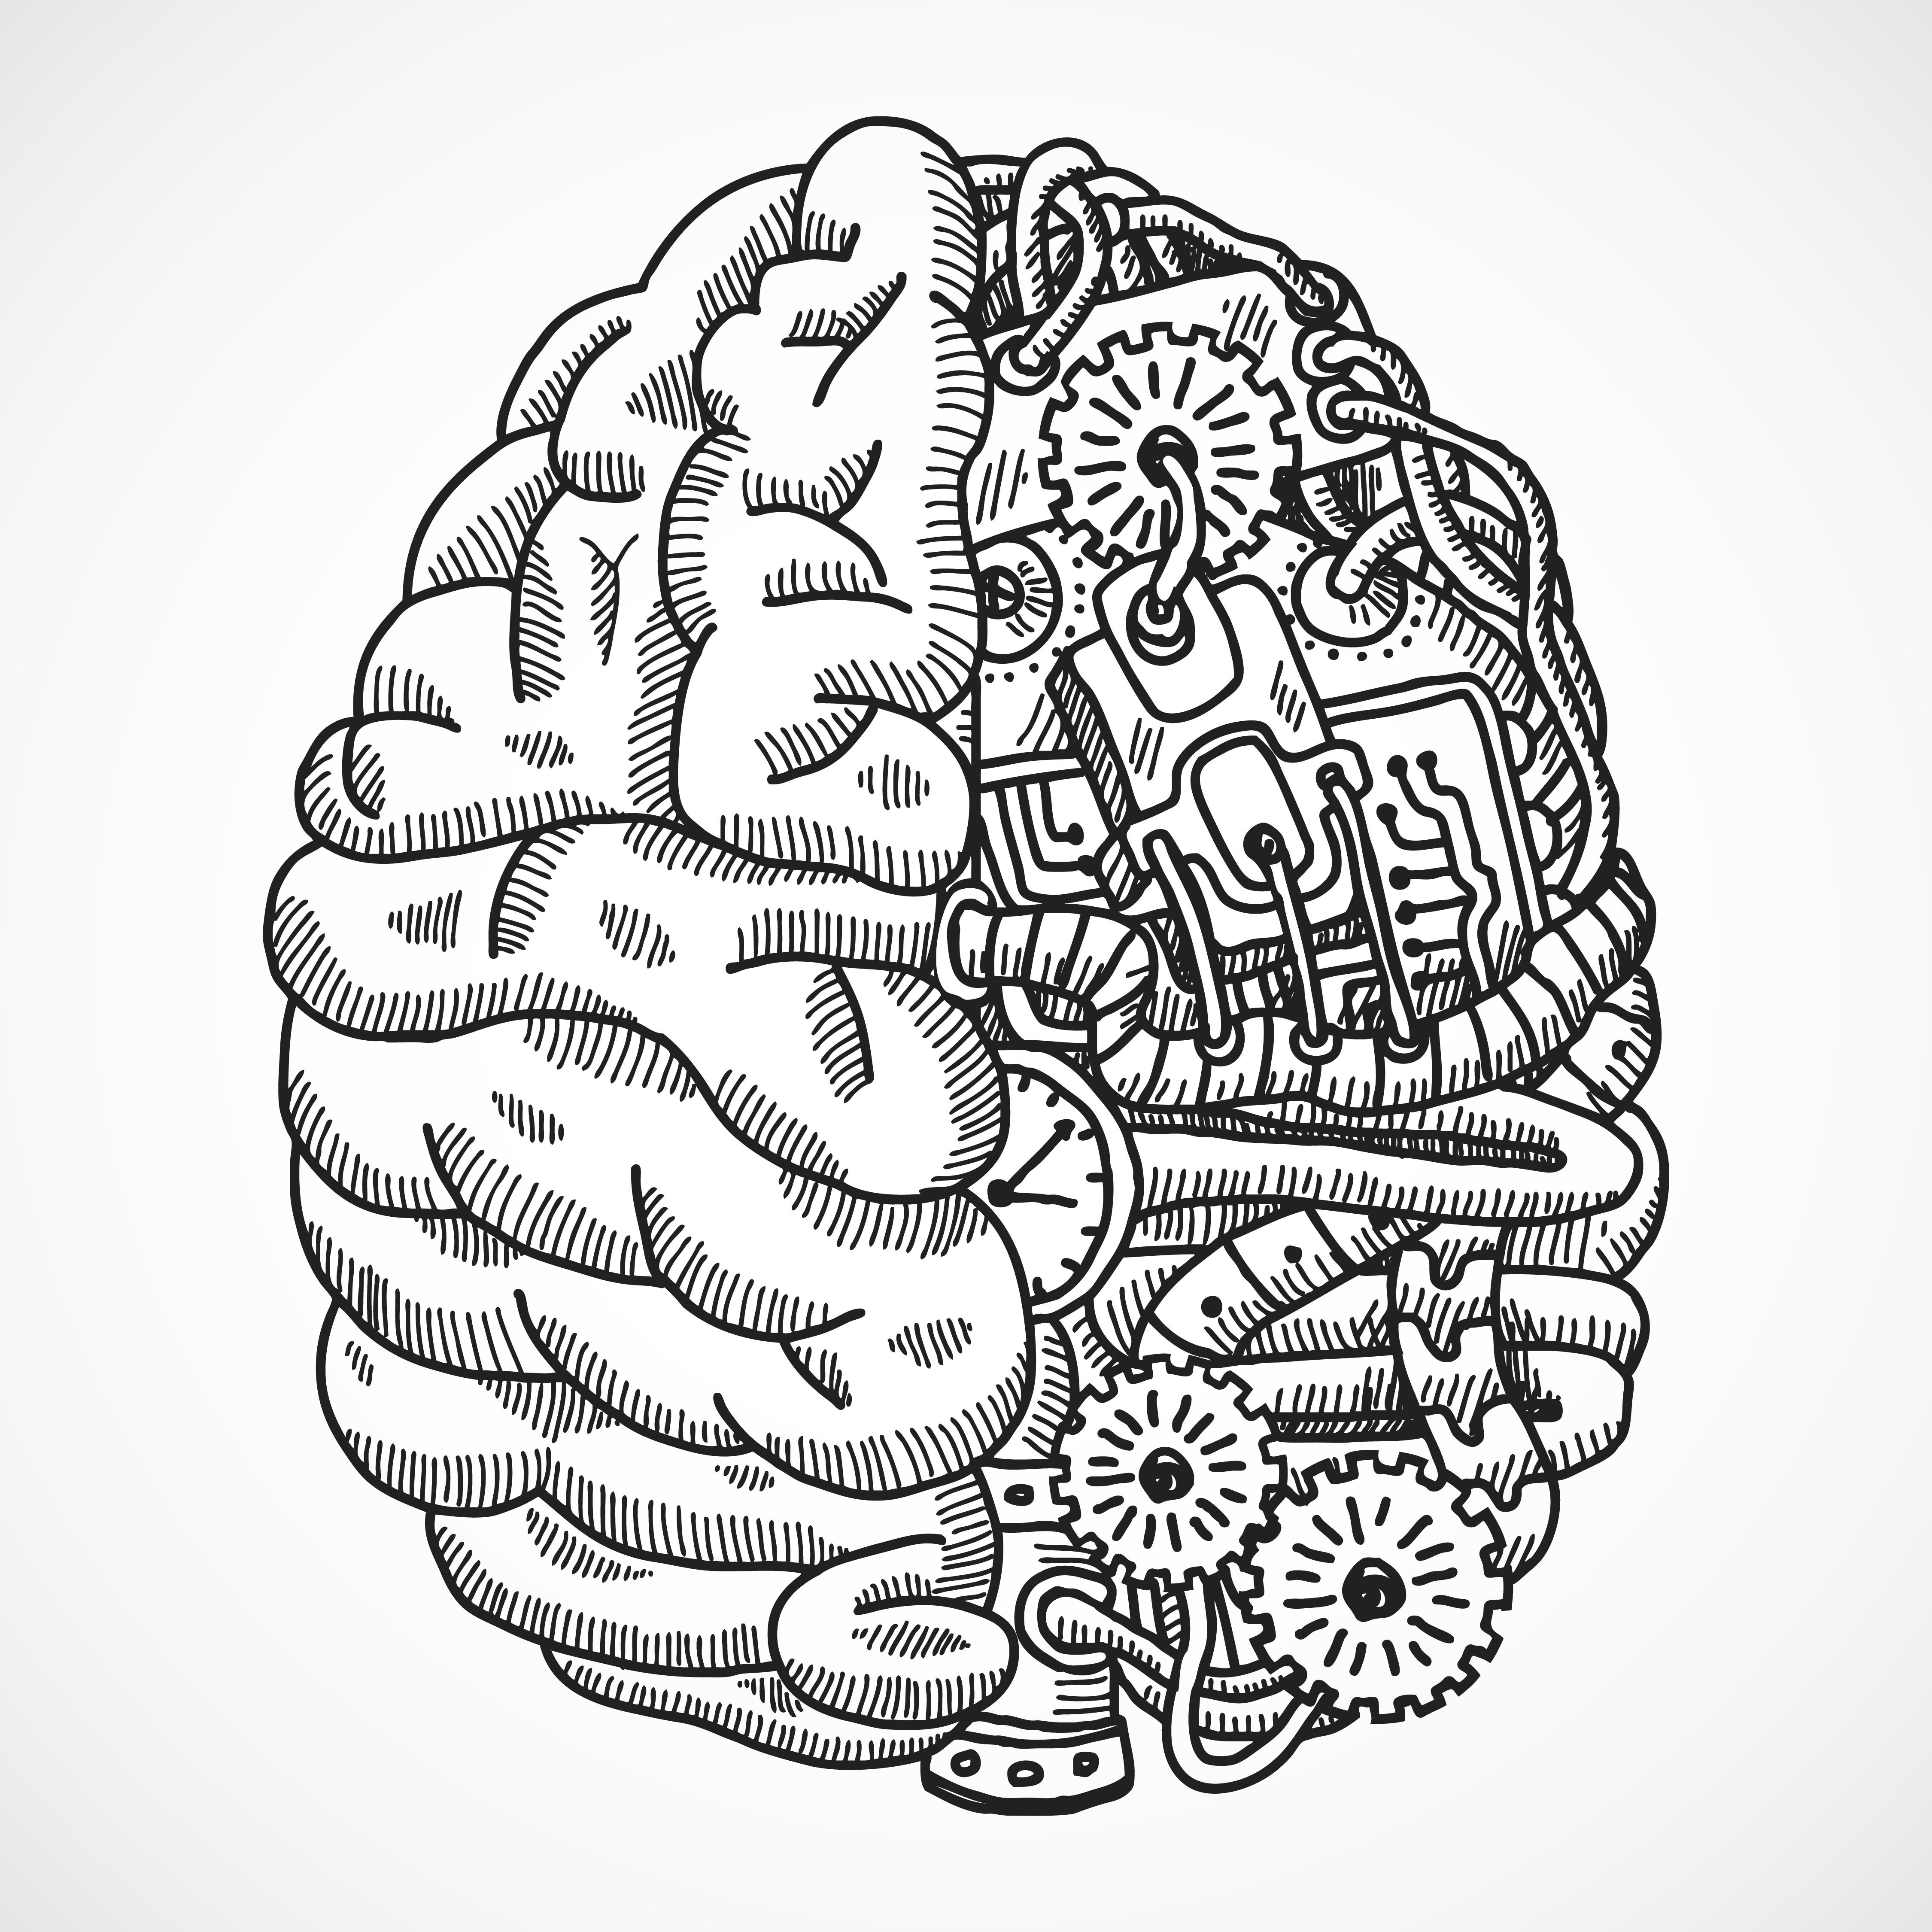 4500x4500 Brain Drawing Tumblr